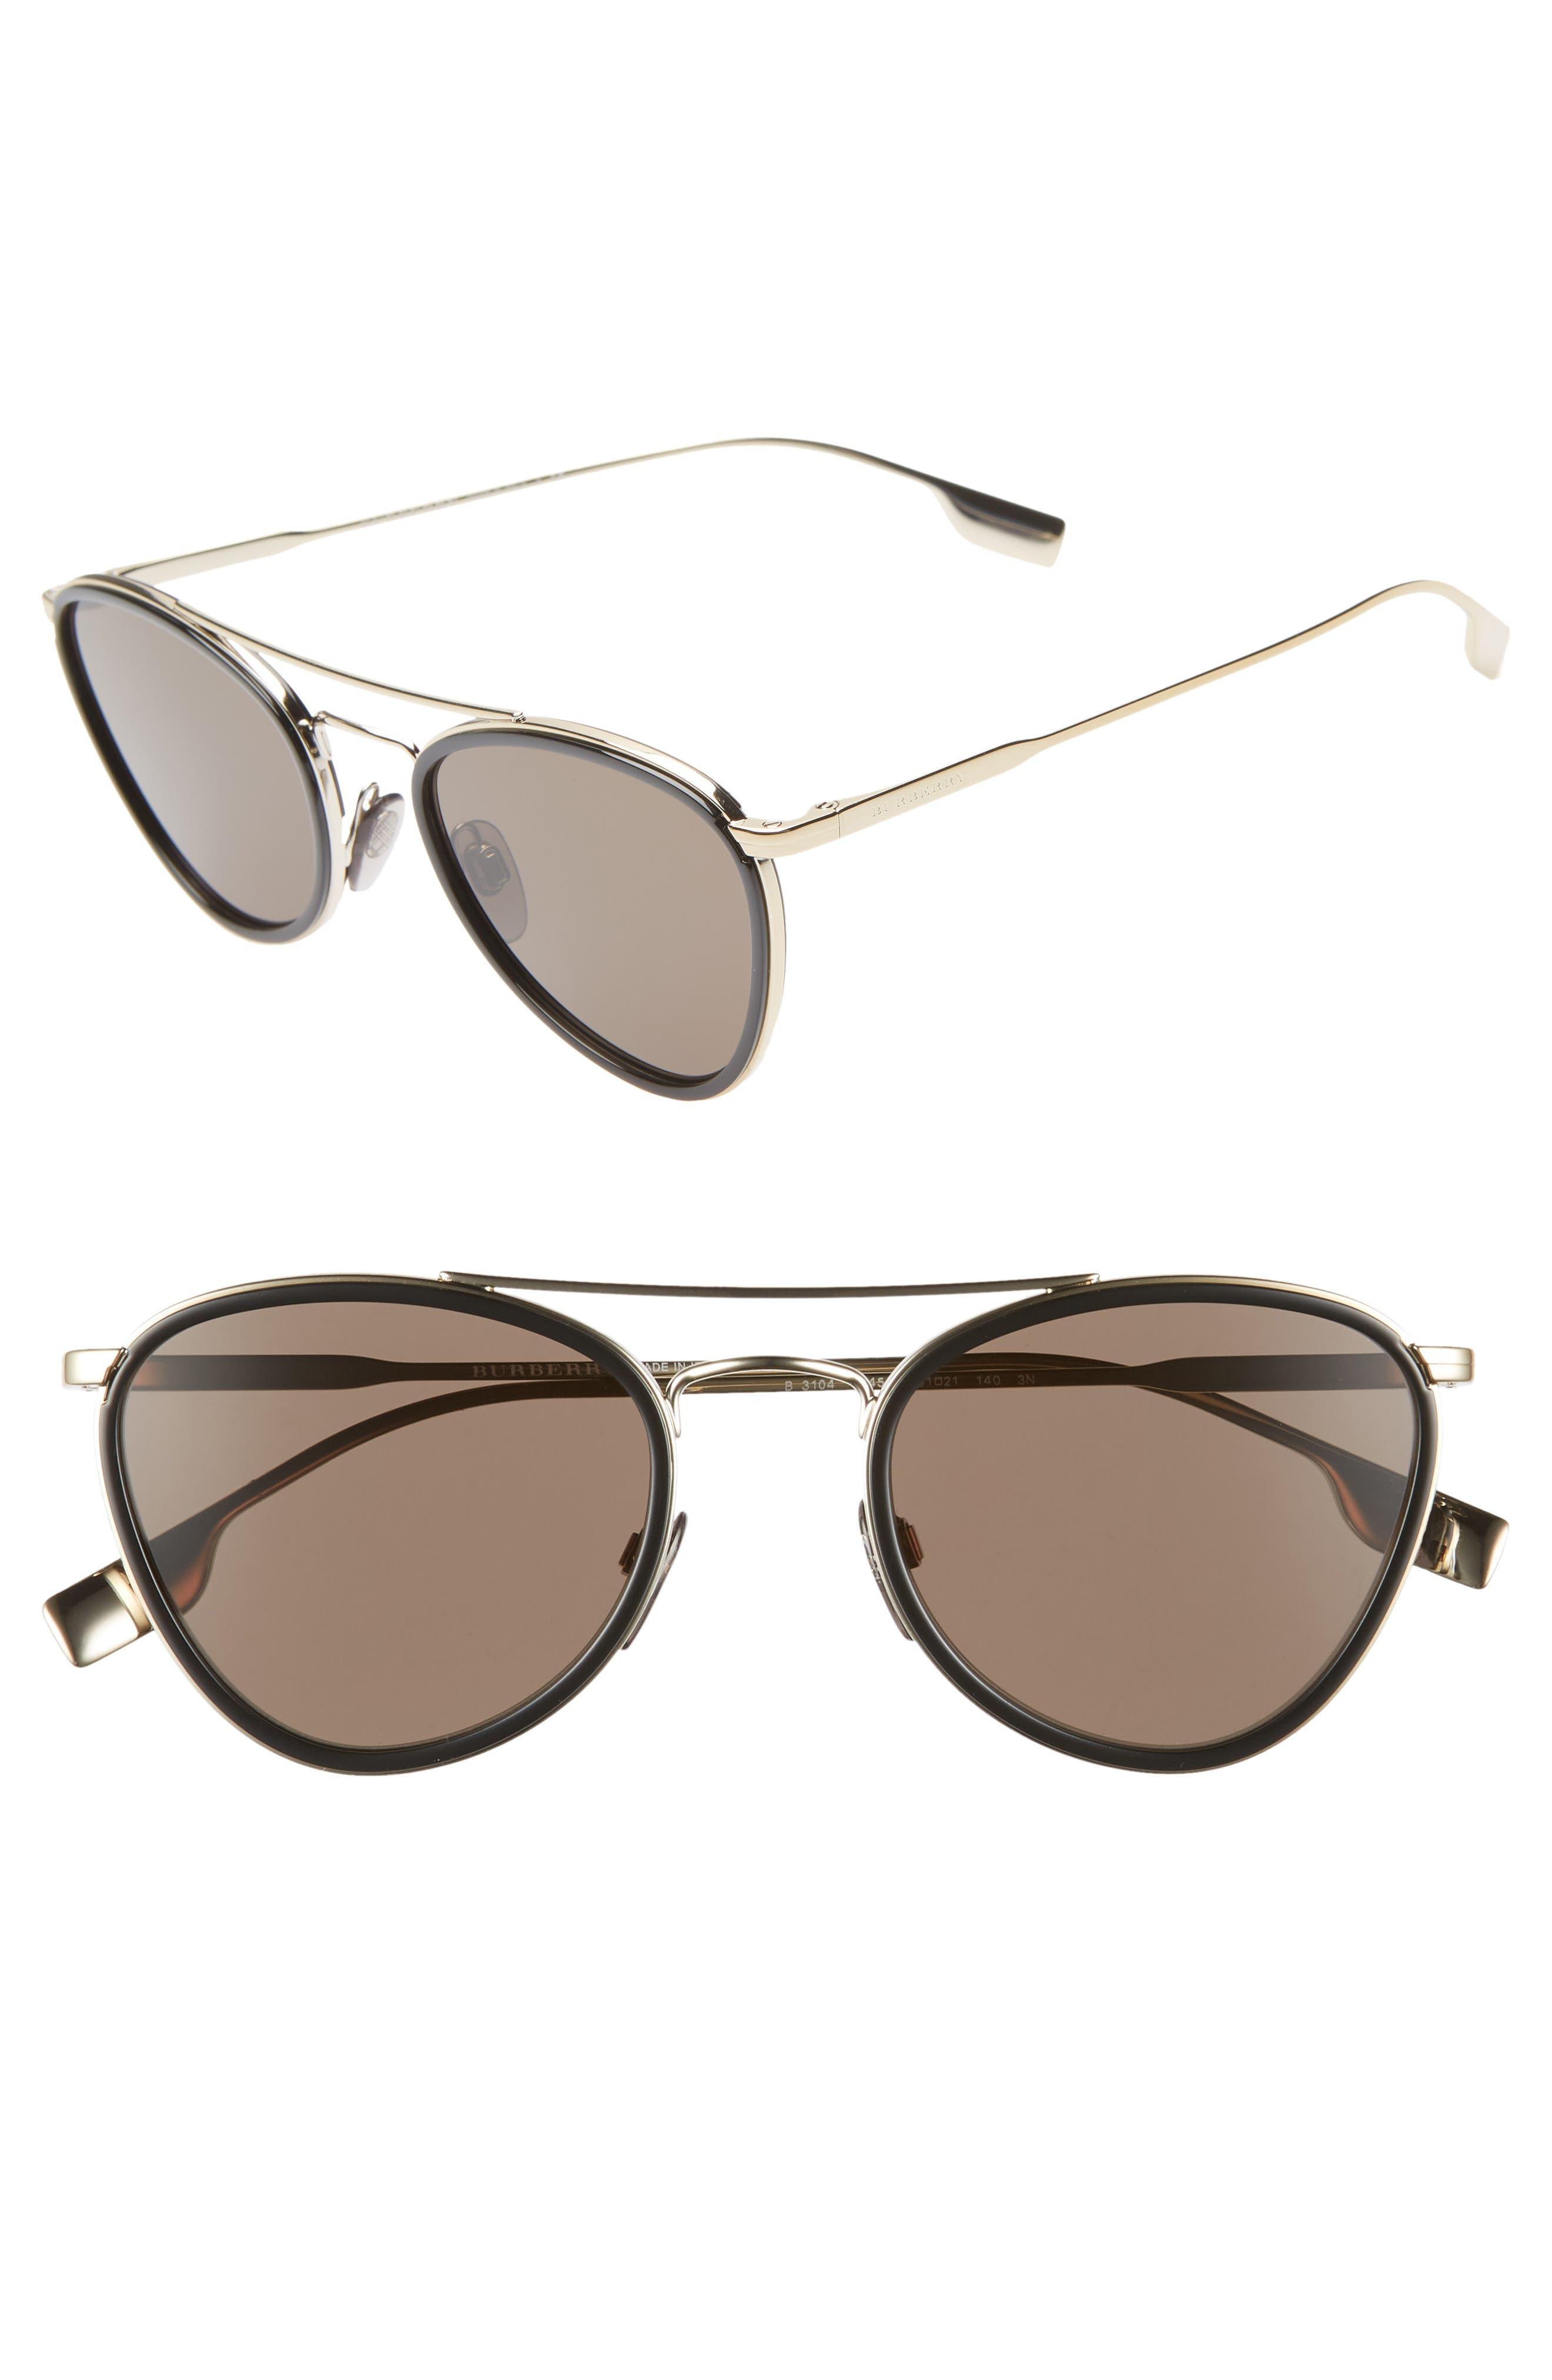 51mm Aviator Sunglasses,                             Main thumbnail 1, color,                             BLACK/ GOLD SOLID